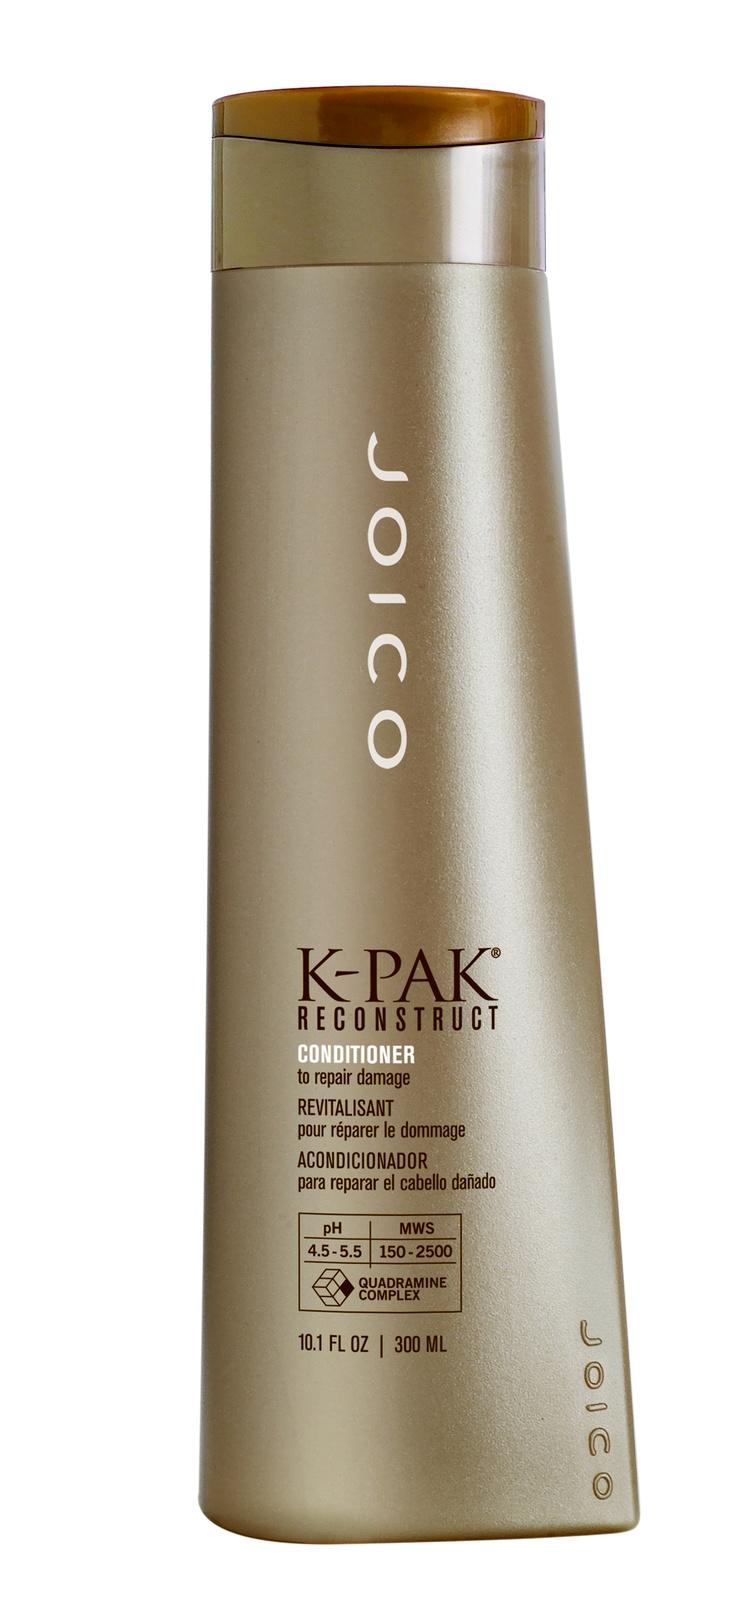 JOICO Hair Product K PAK Conditionera Fabulous Product